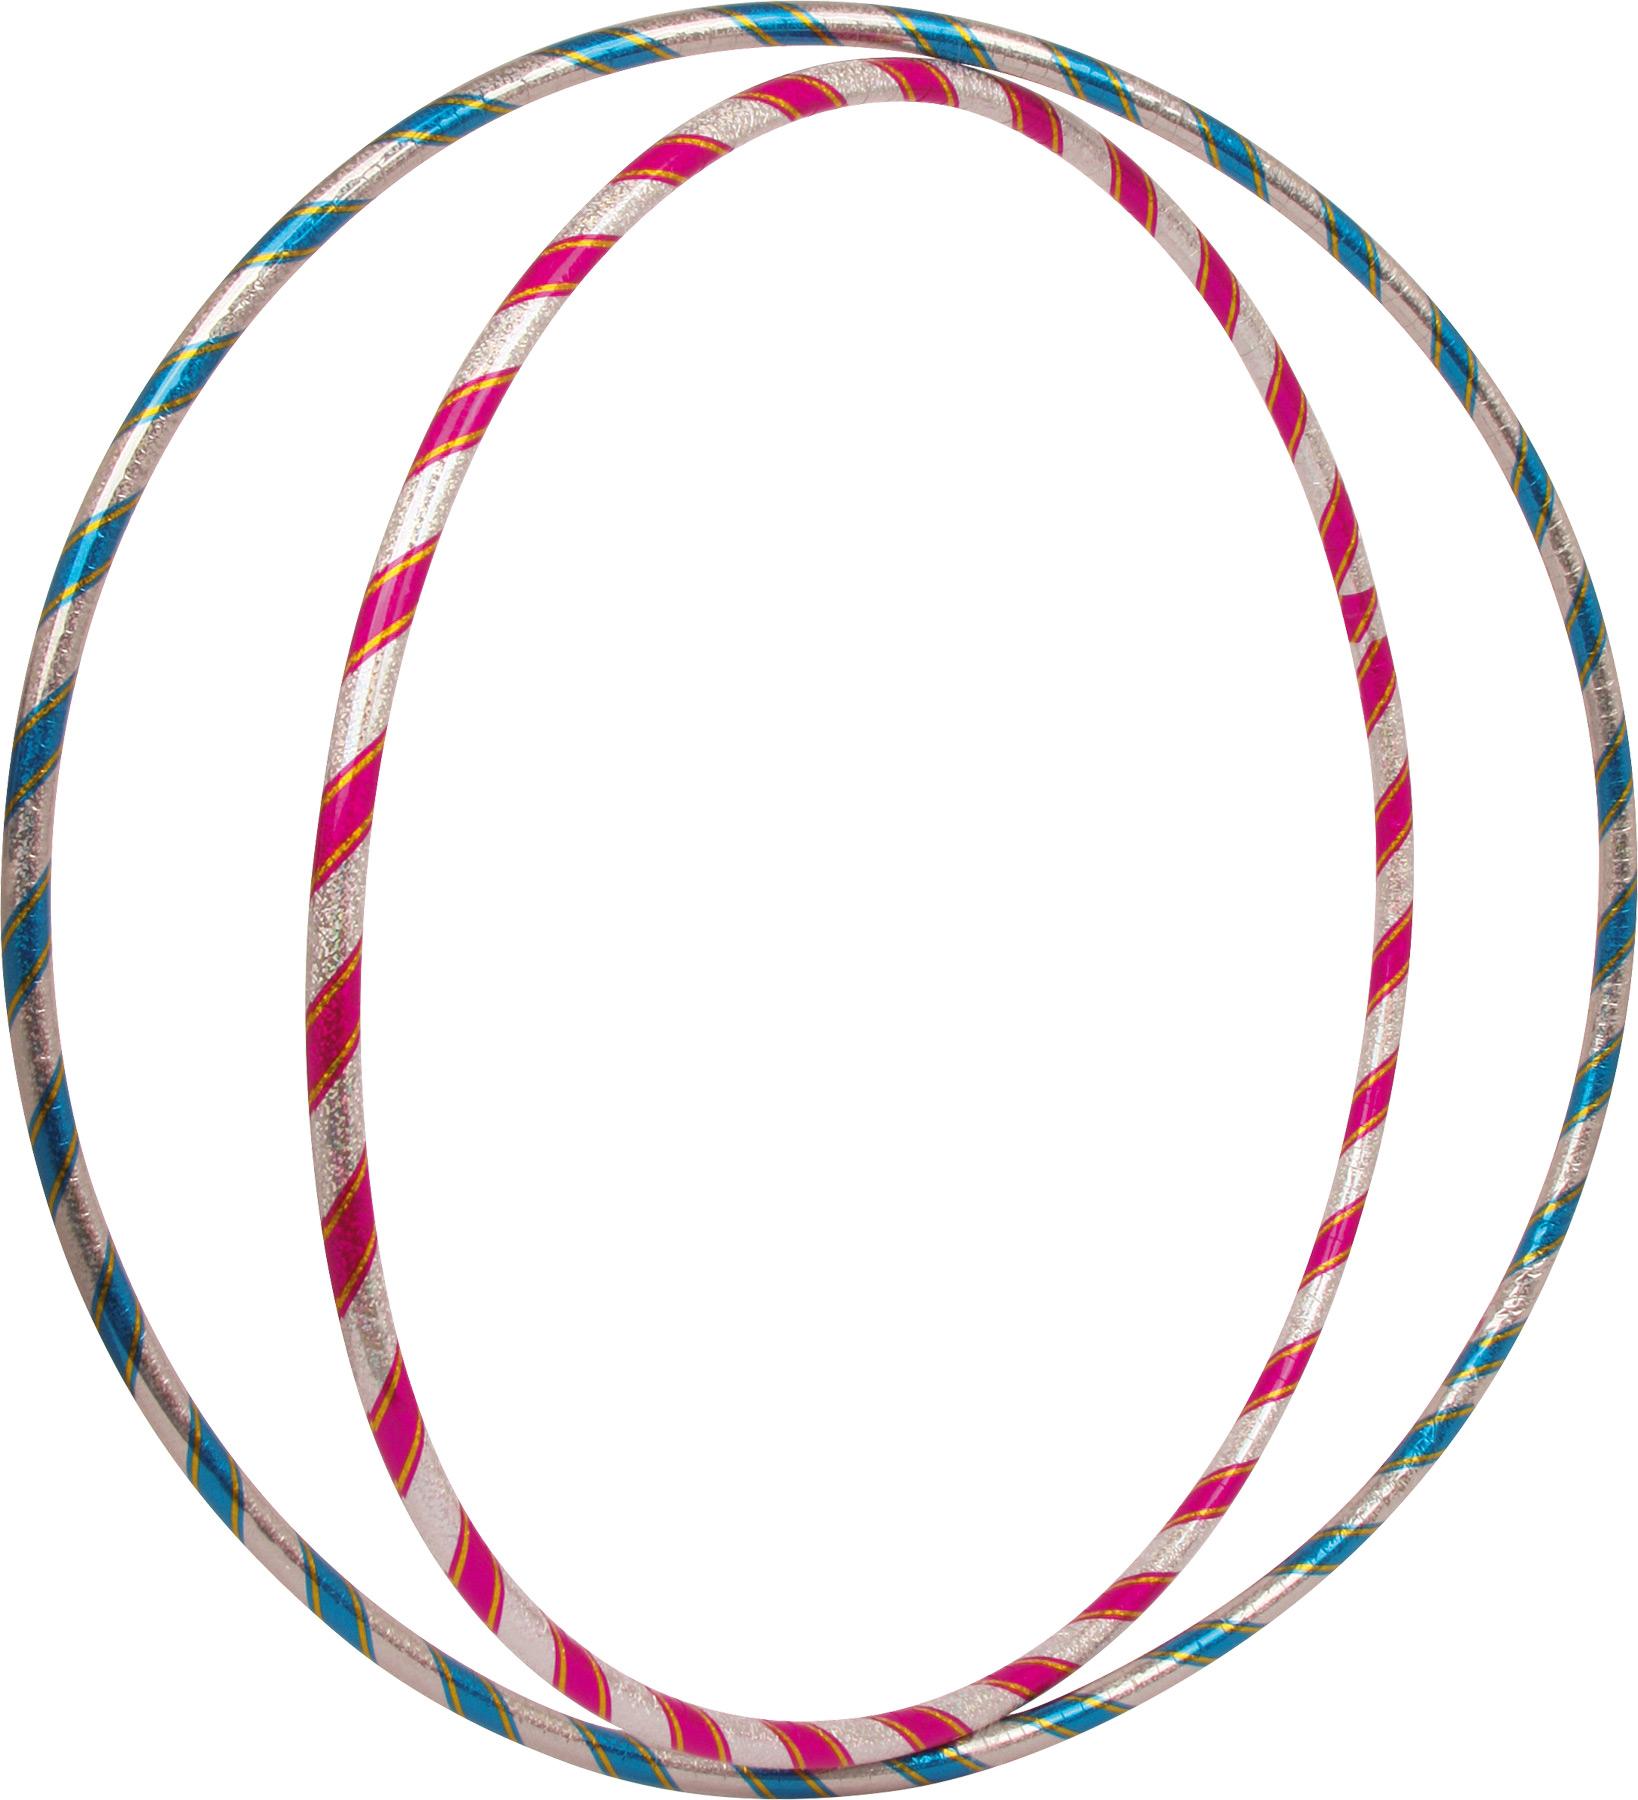 Small Foot Kruhy hula hoop